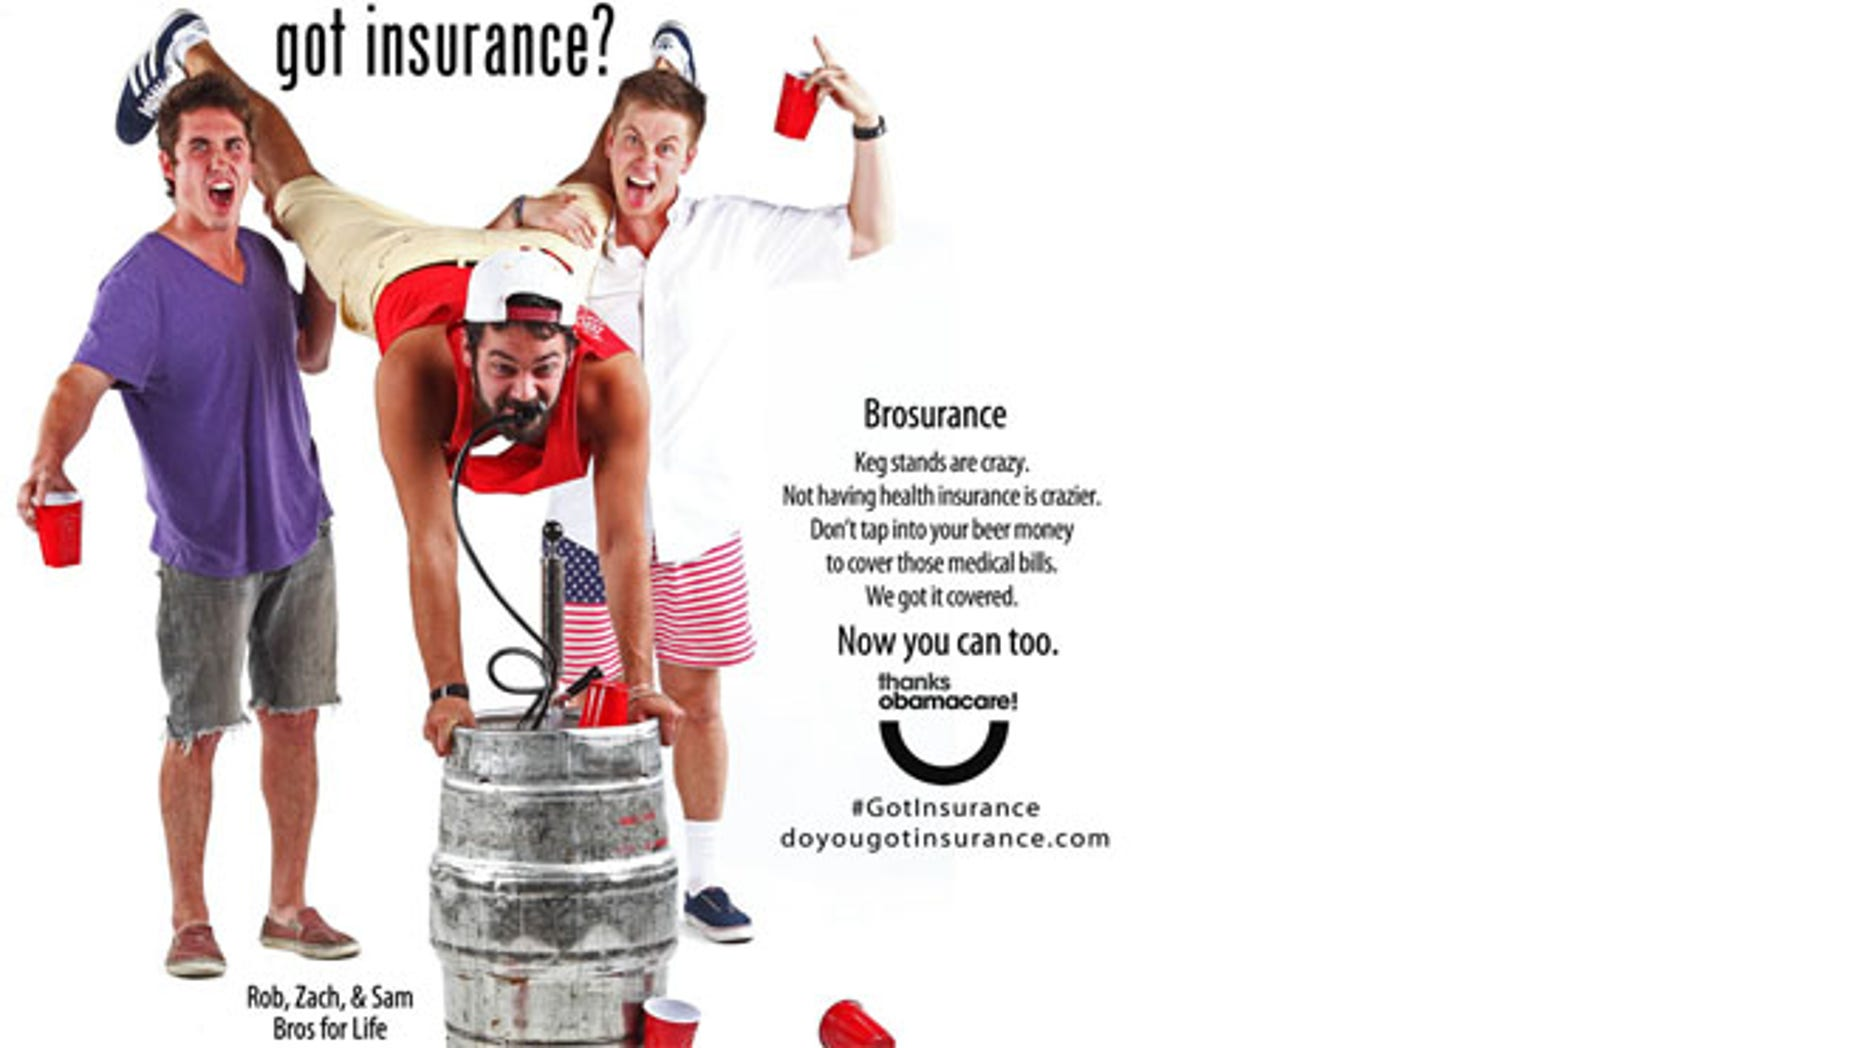 ObamaCare ads running in Colorado via GotInsuranceColorado.org.